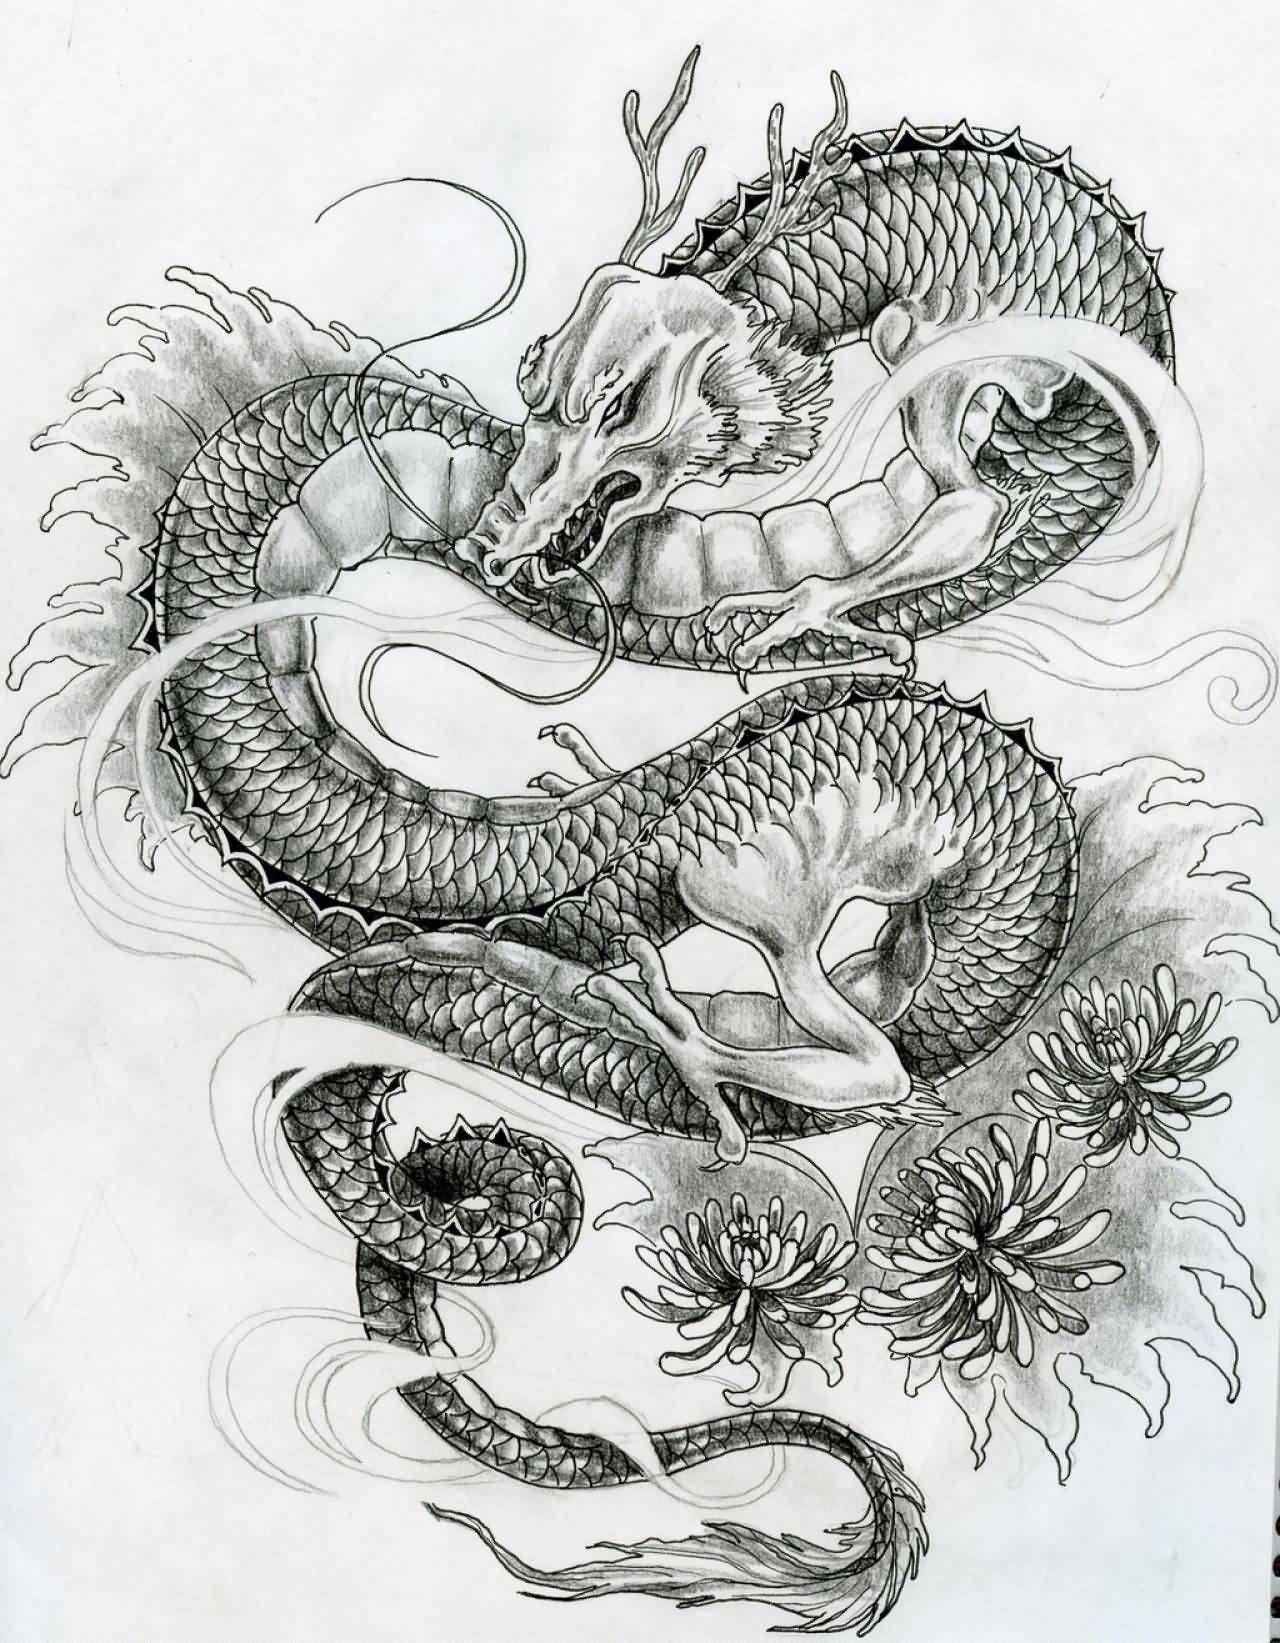 Latest Black Ink Japanese Dragon Tattoo Design By Elyspencer In 2020 Japanese Dragon Tattoos 3d Dragon Tattoo Dragon Tattoo Designs